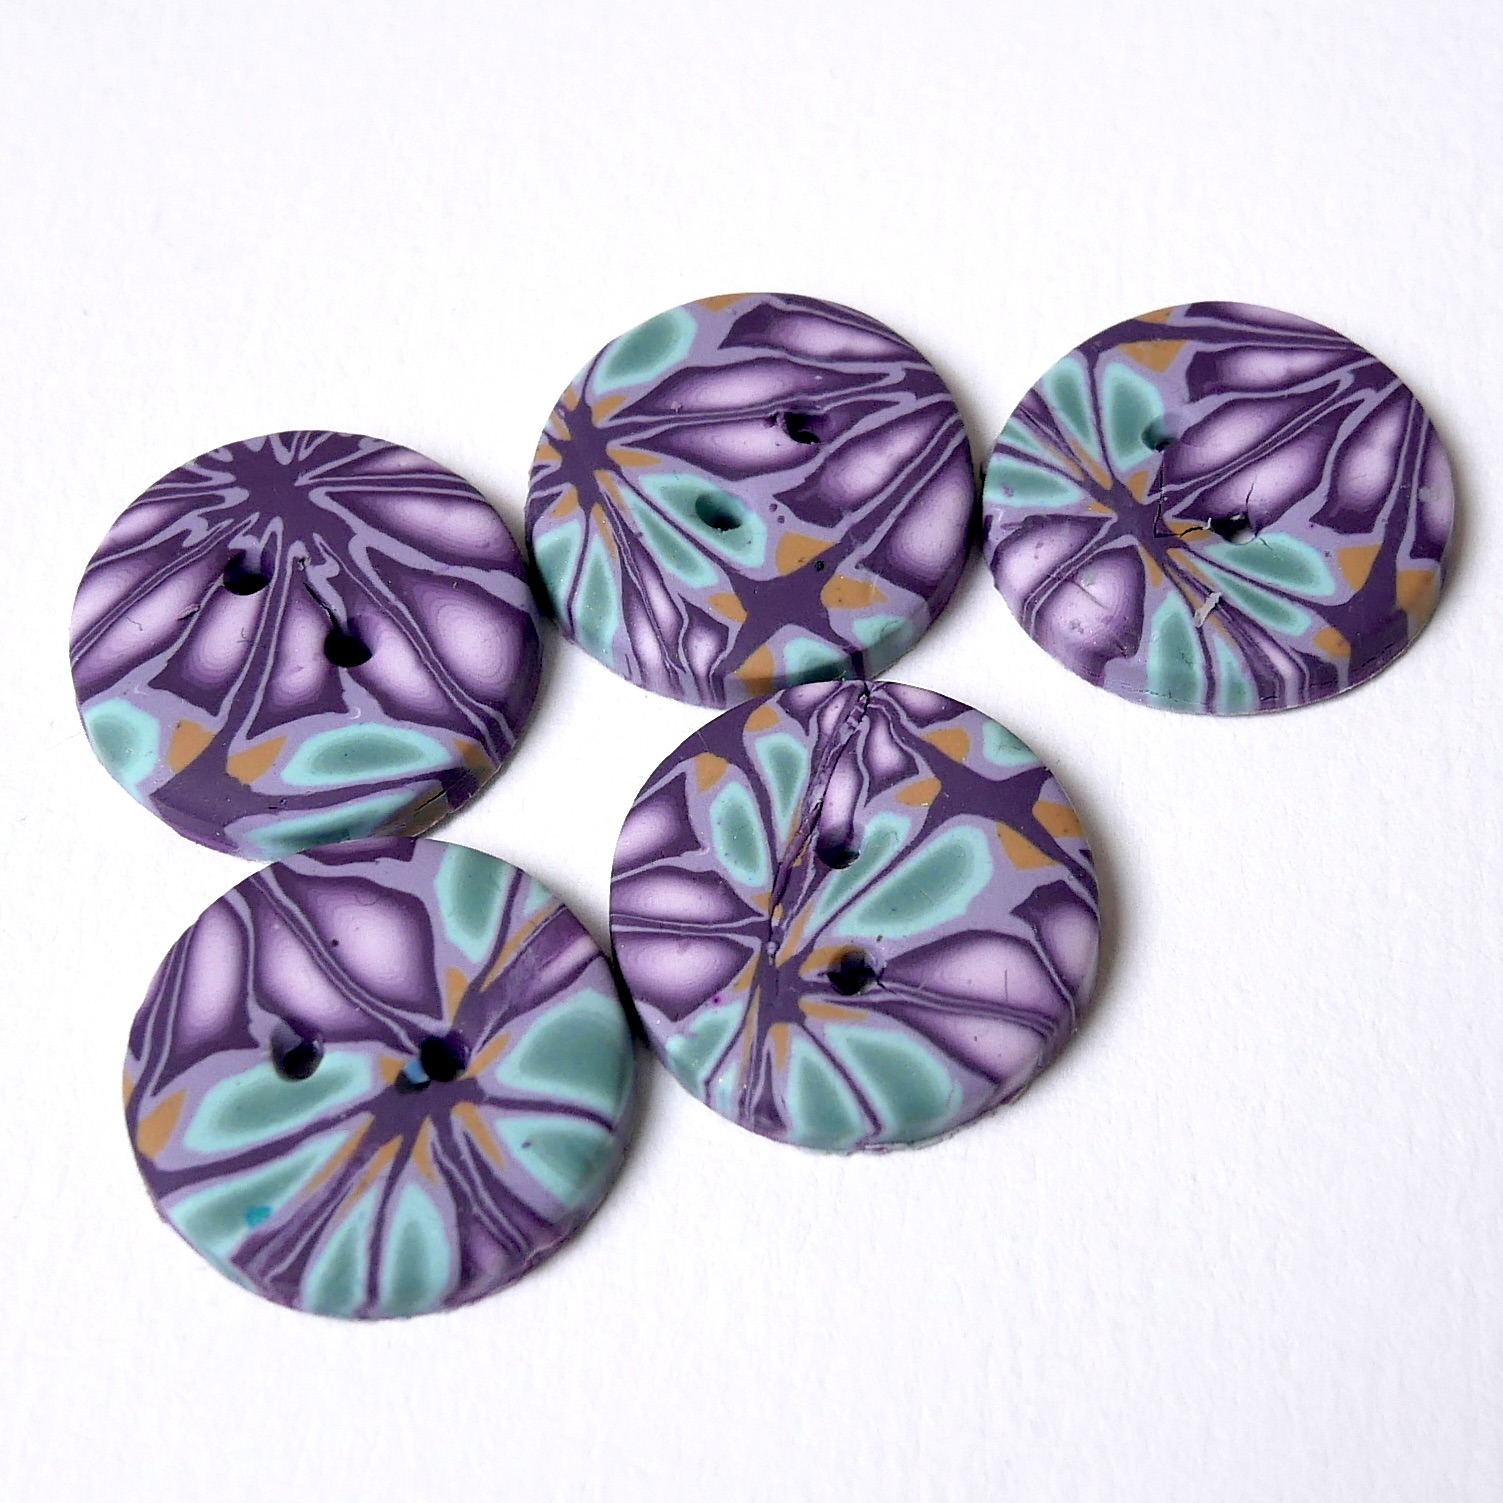 Handmade Buttons, Unique Buttons